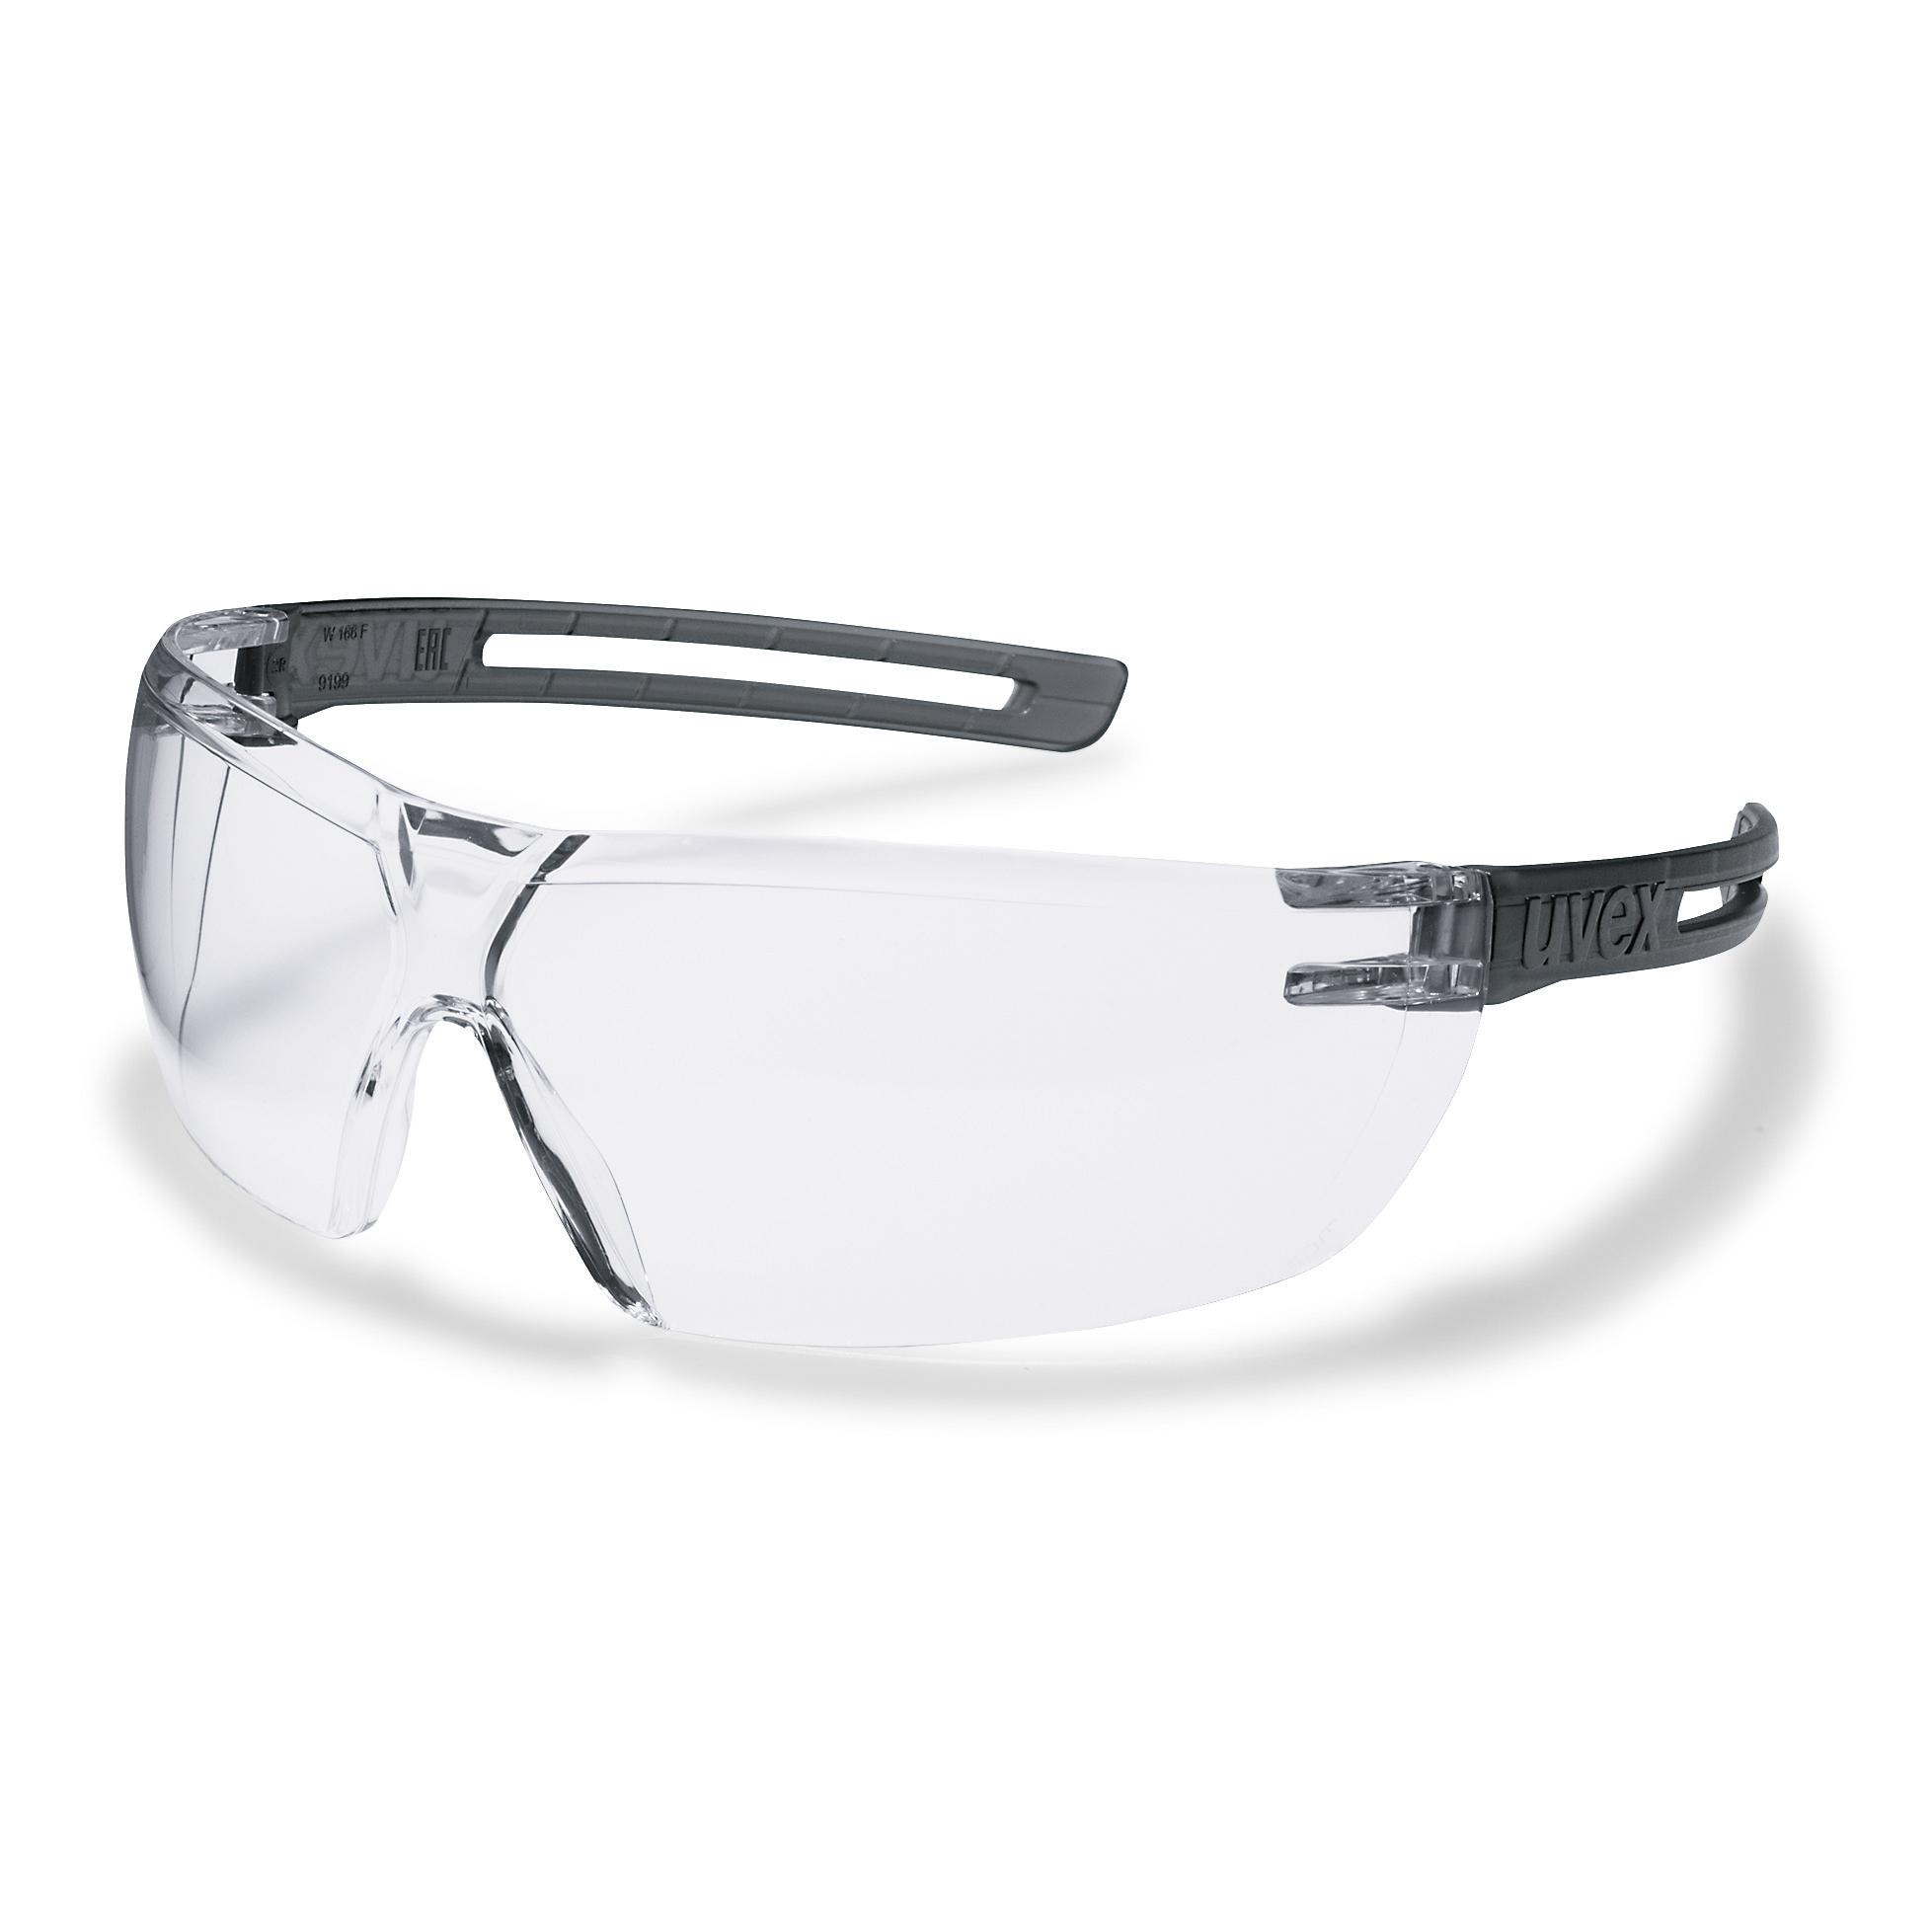 Lunettes à branches uvex x-fit   Protection des yeux   uvex safety 35ba5c457c53